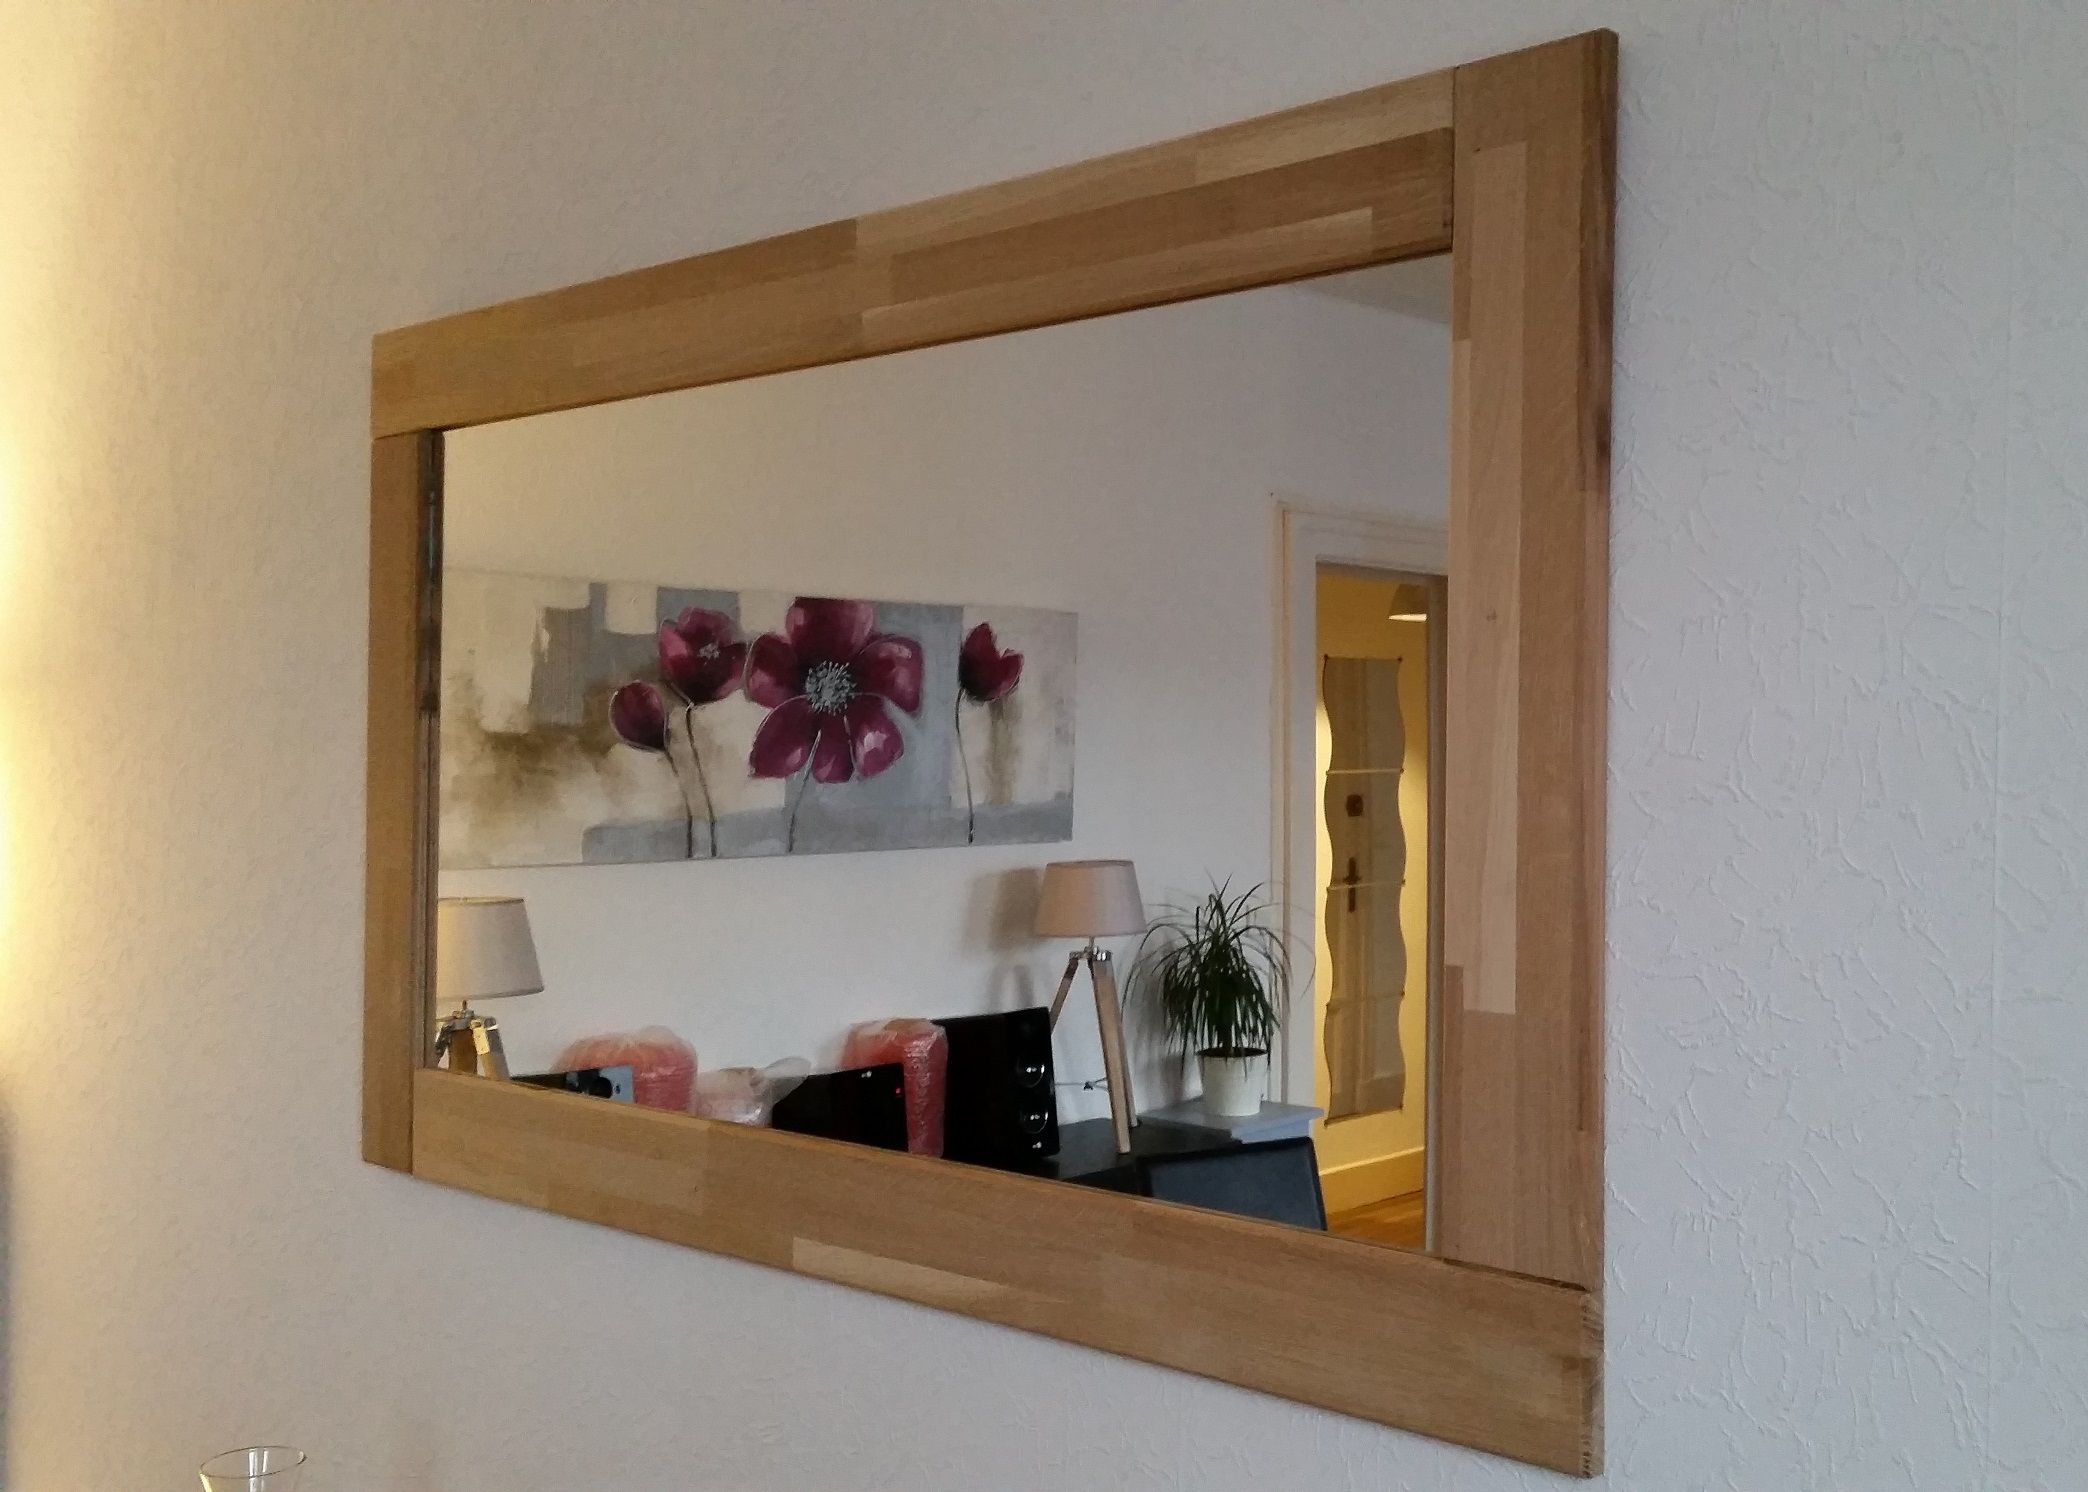 Fabrication d 39 un cadre de miroir en ch ne projets for Miroir en solde